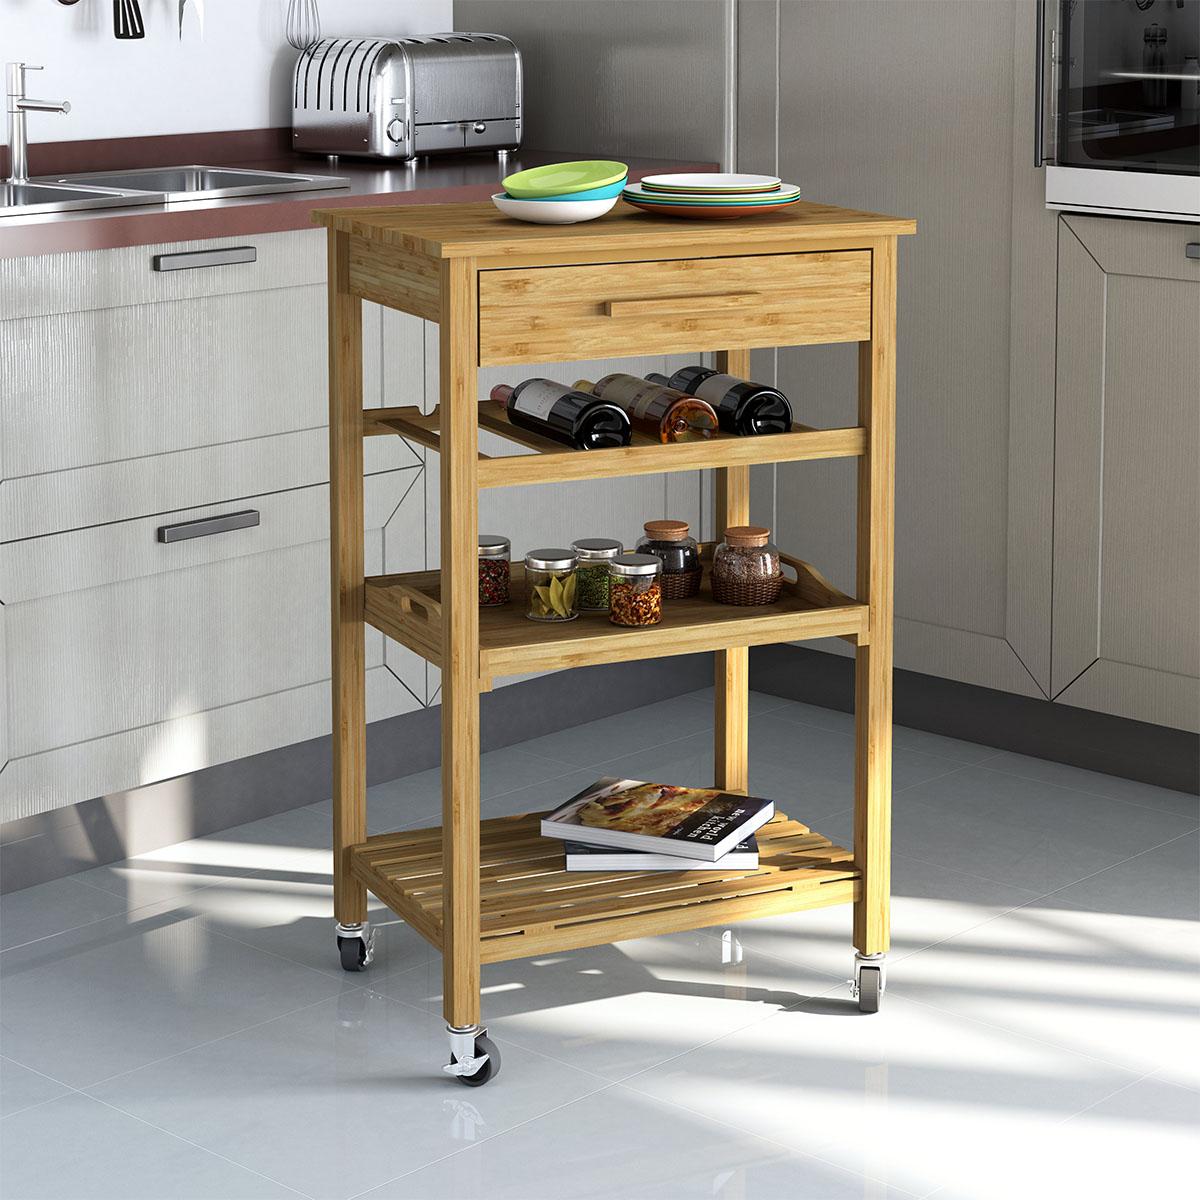 Bamboo Kitchen Island Bar Cart Trolley, Wood Cabinet w/ Wine Rack ...